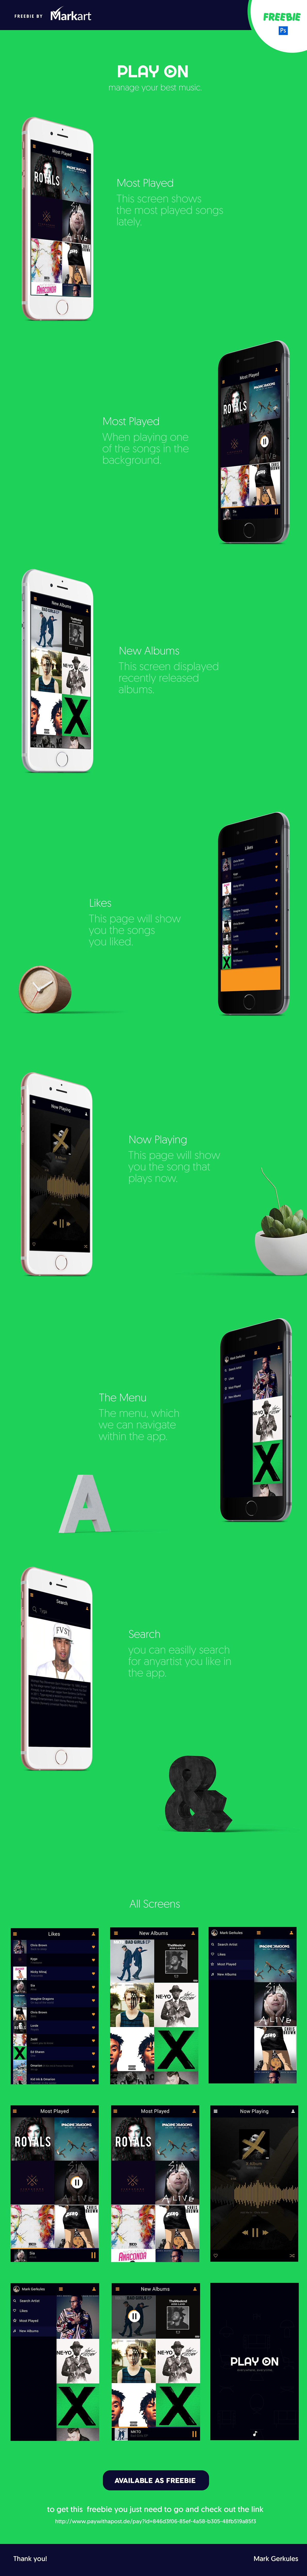 playon app application graphicdesign design UI ux user interface markart mark gerkules